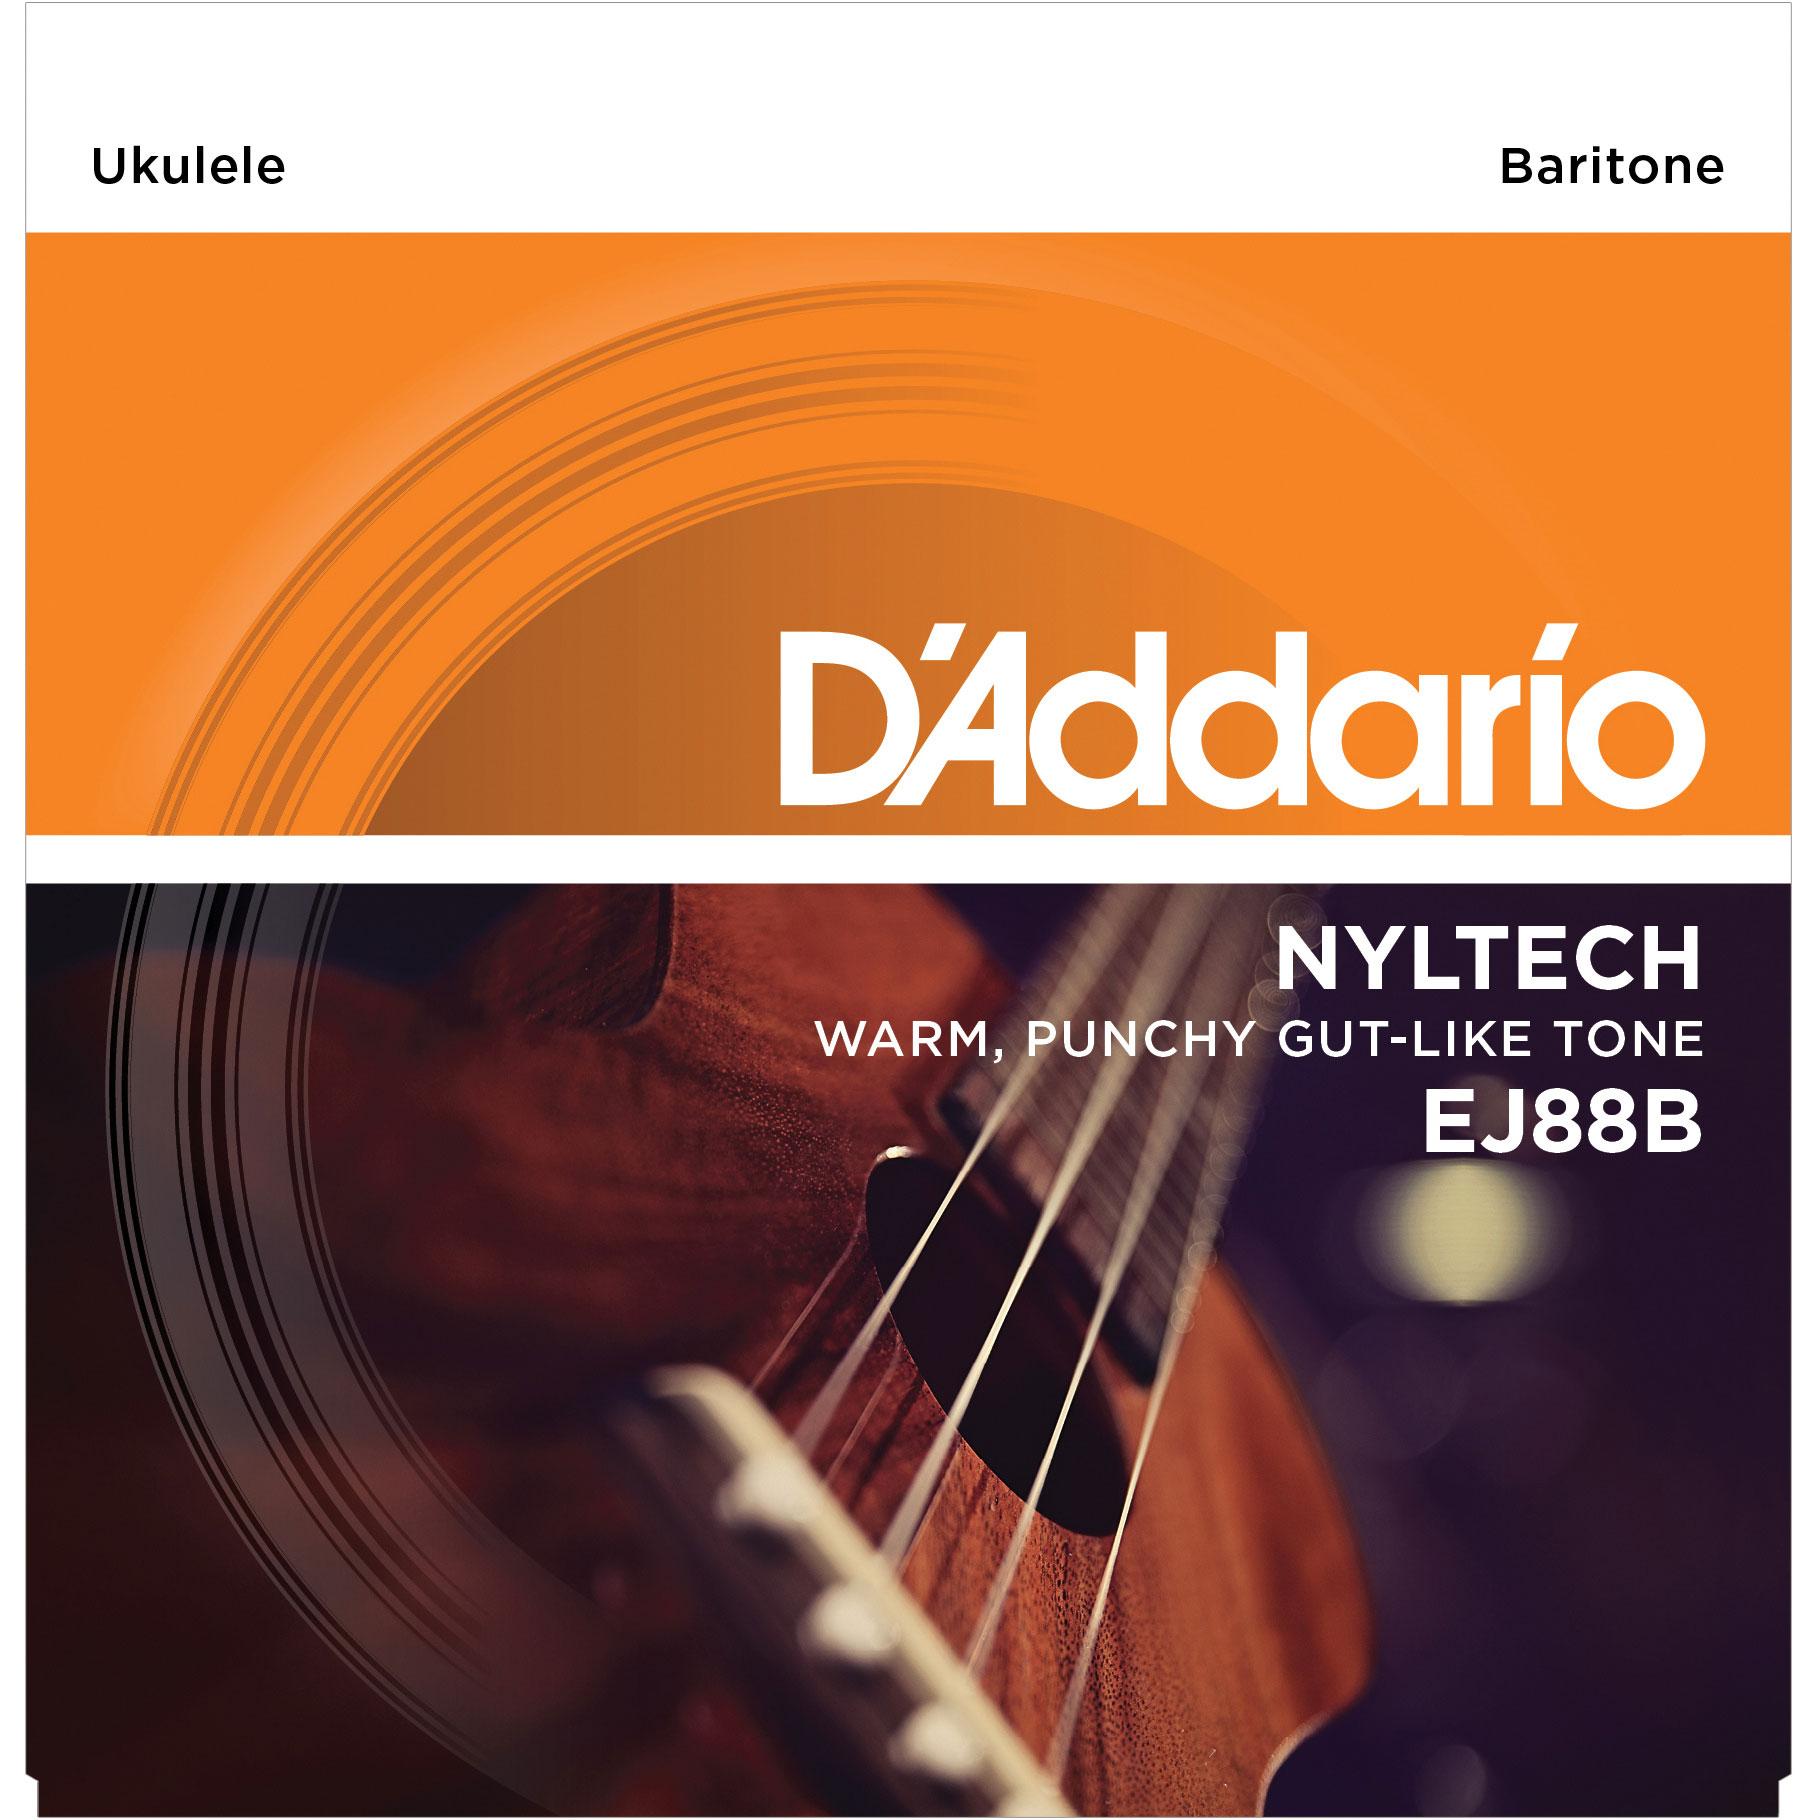 DADDARIO EJ88B NYLTECH BARITONE